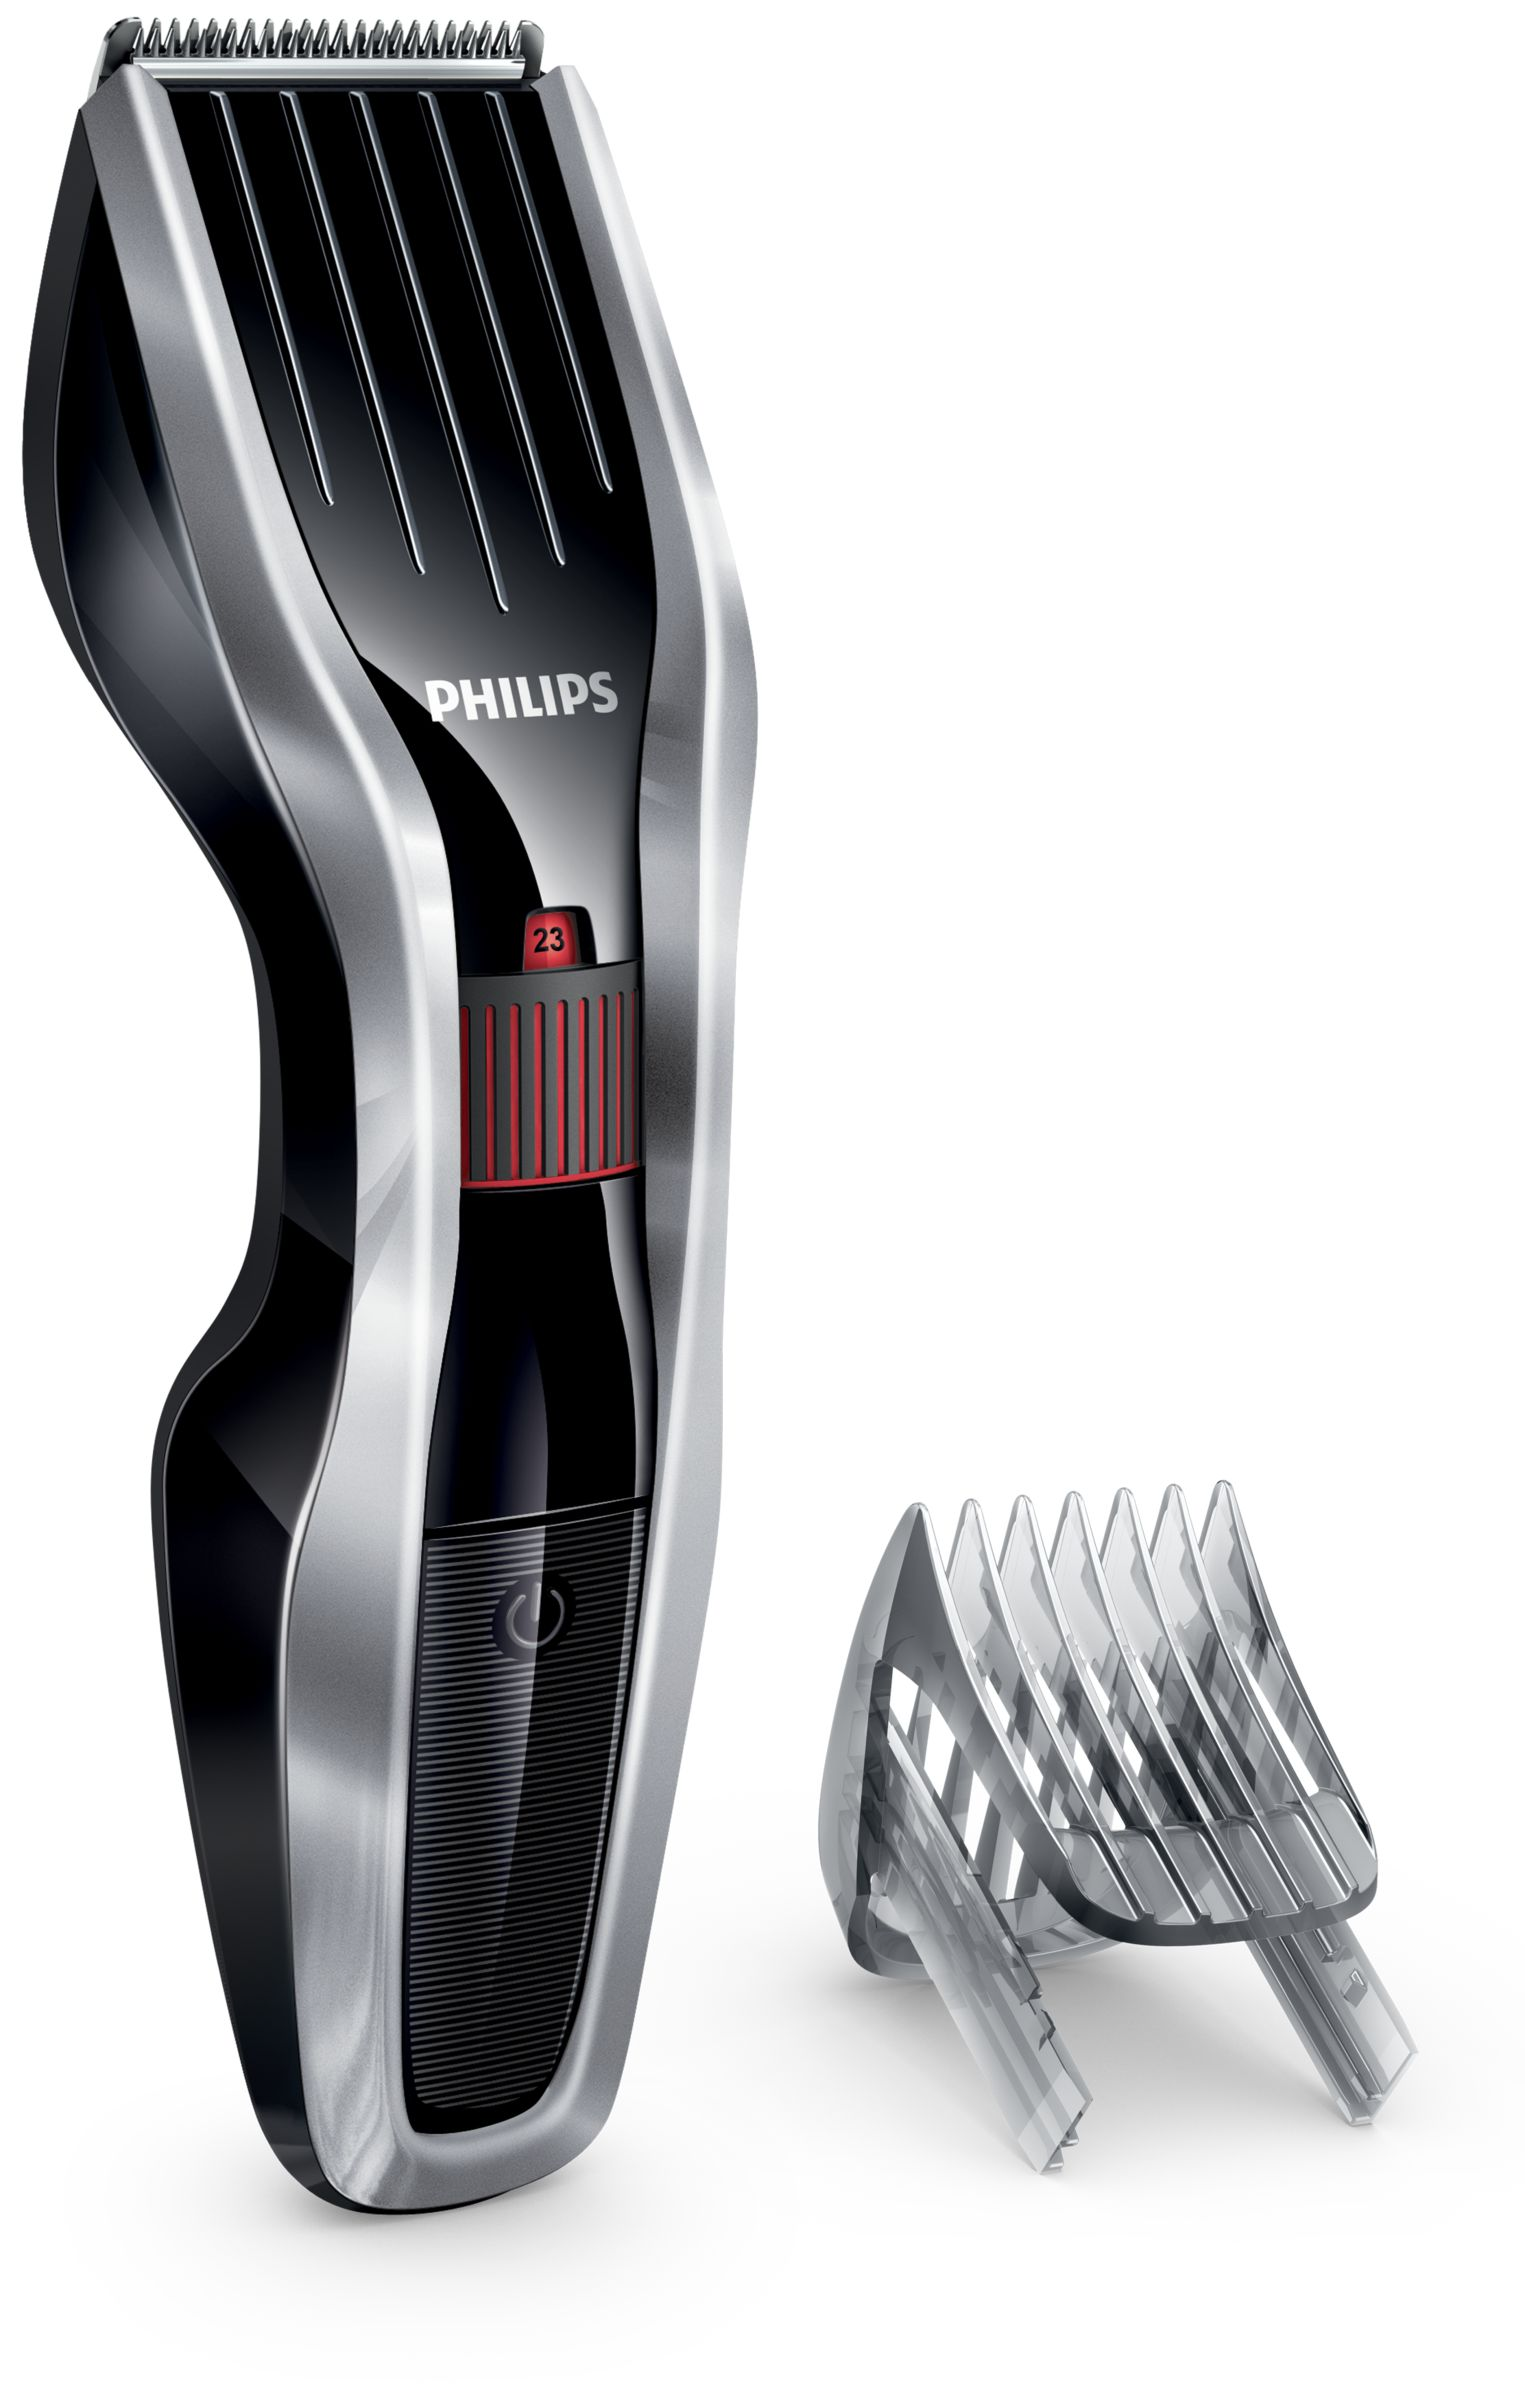 Philips Tagliacapelli Carrefour